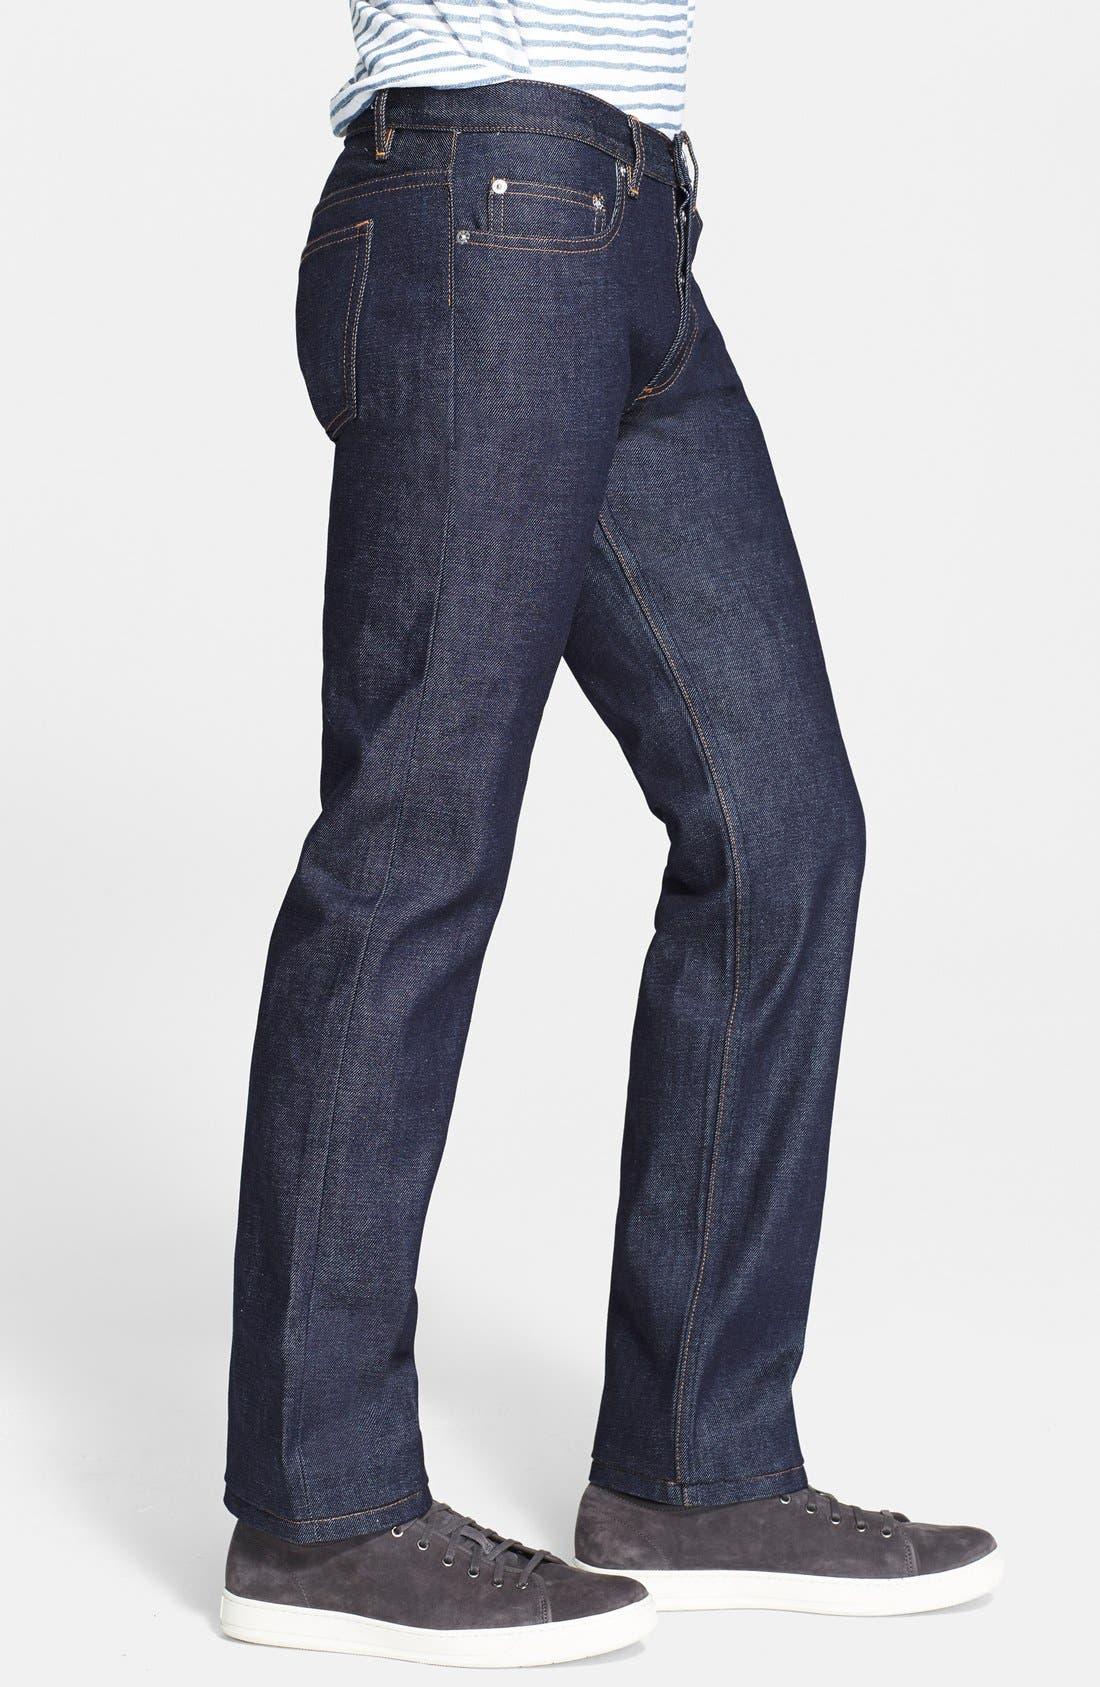 New Standard Slim Straight Leg Raw Selvedge Jeans,                             Alternate thumbnail 2, color,                             INDIGO WASH